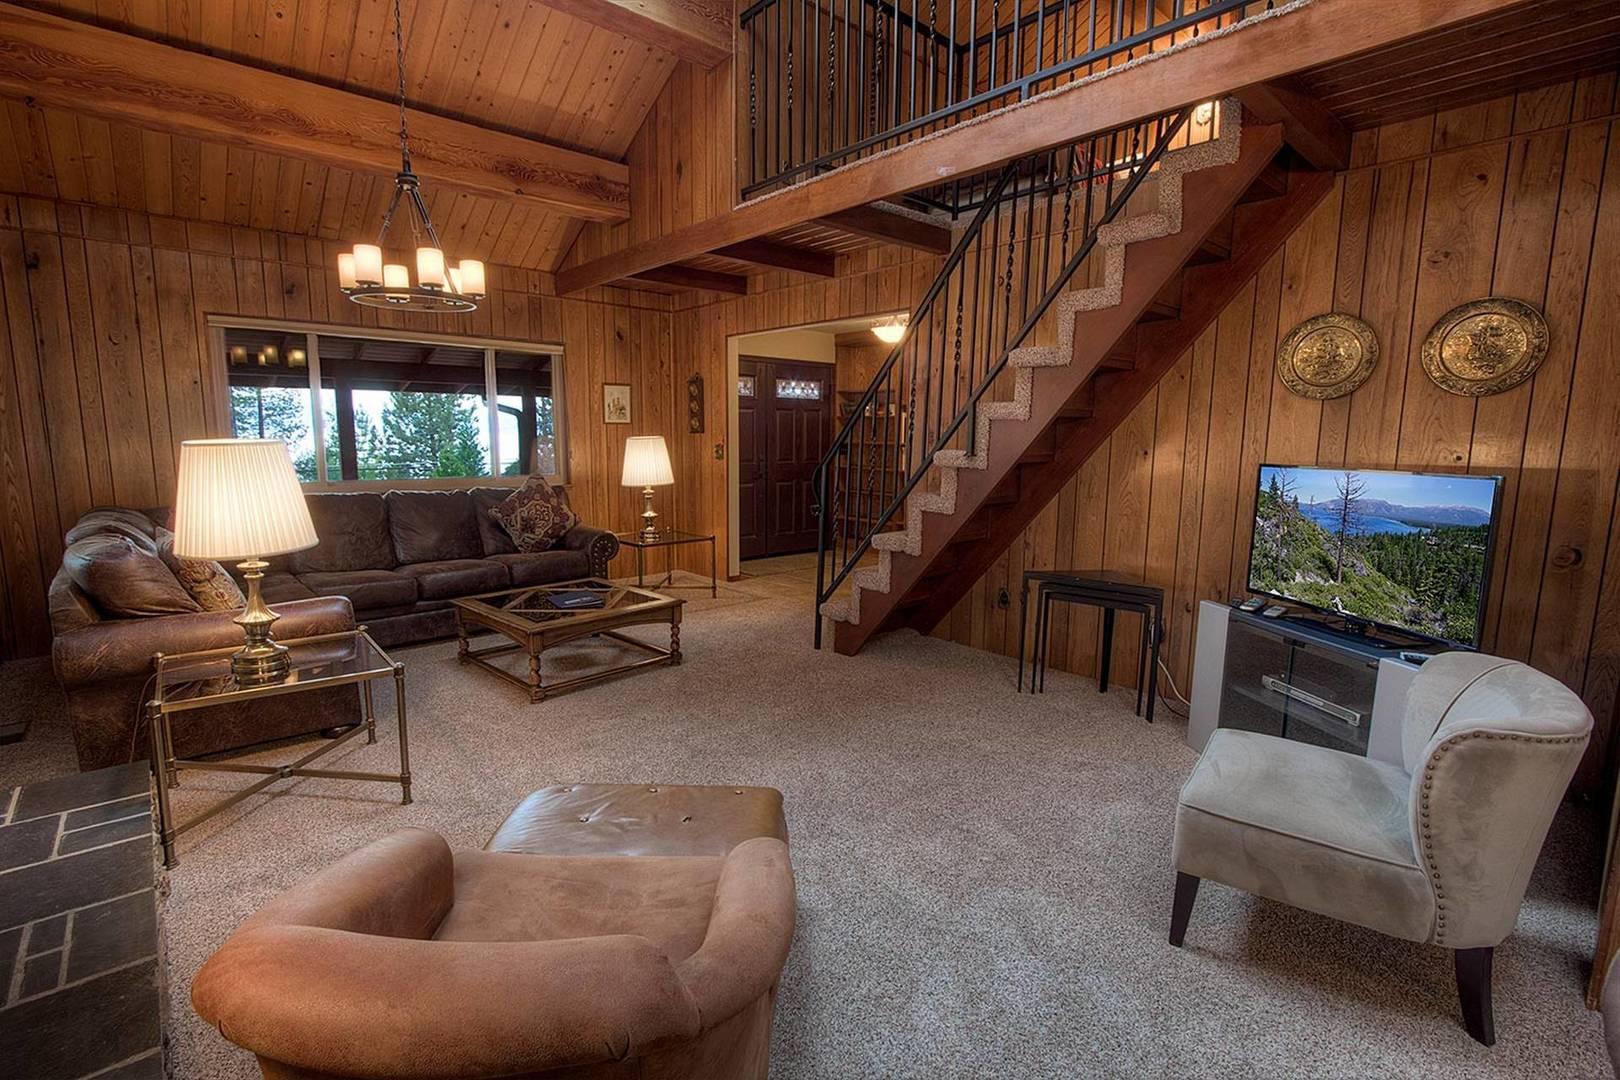 nvh0721 living room